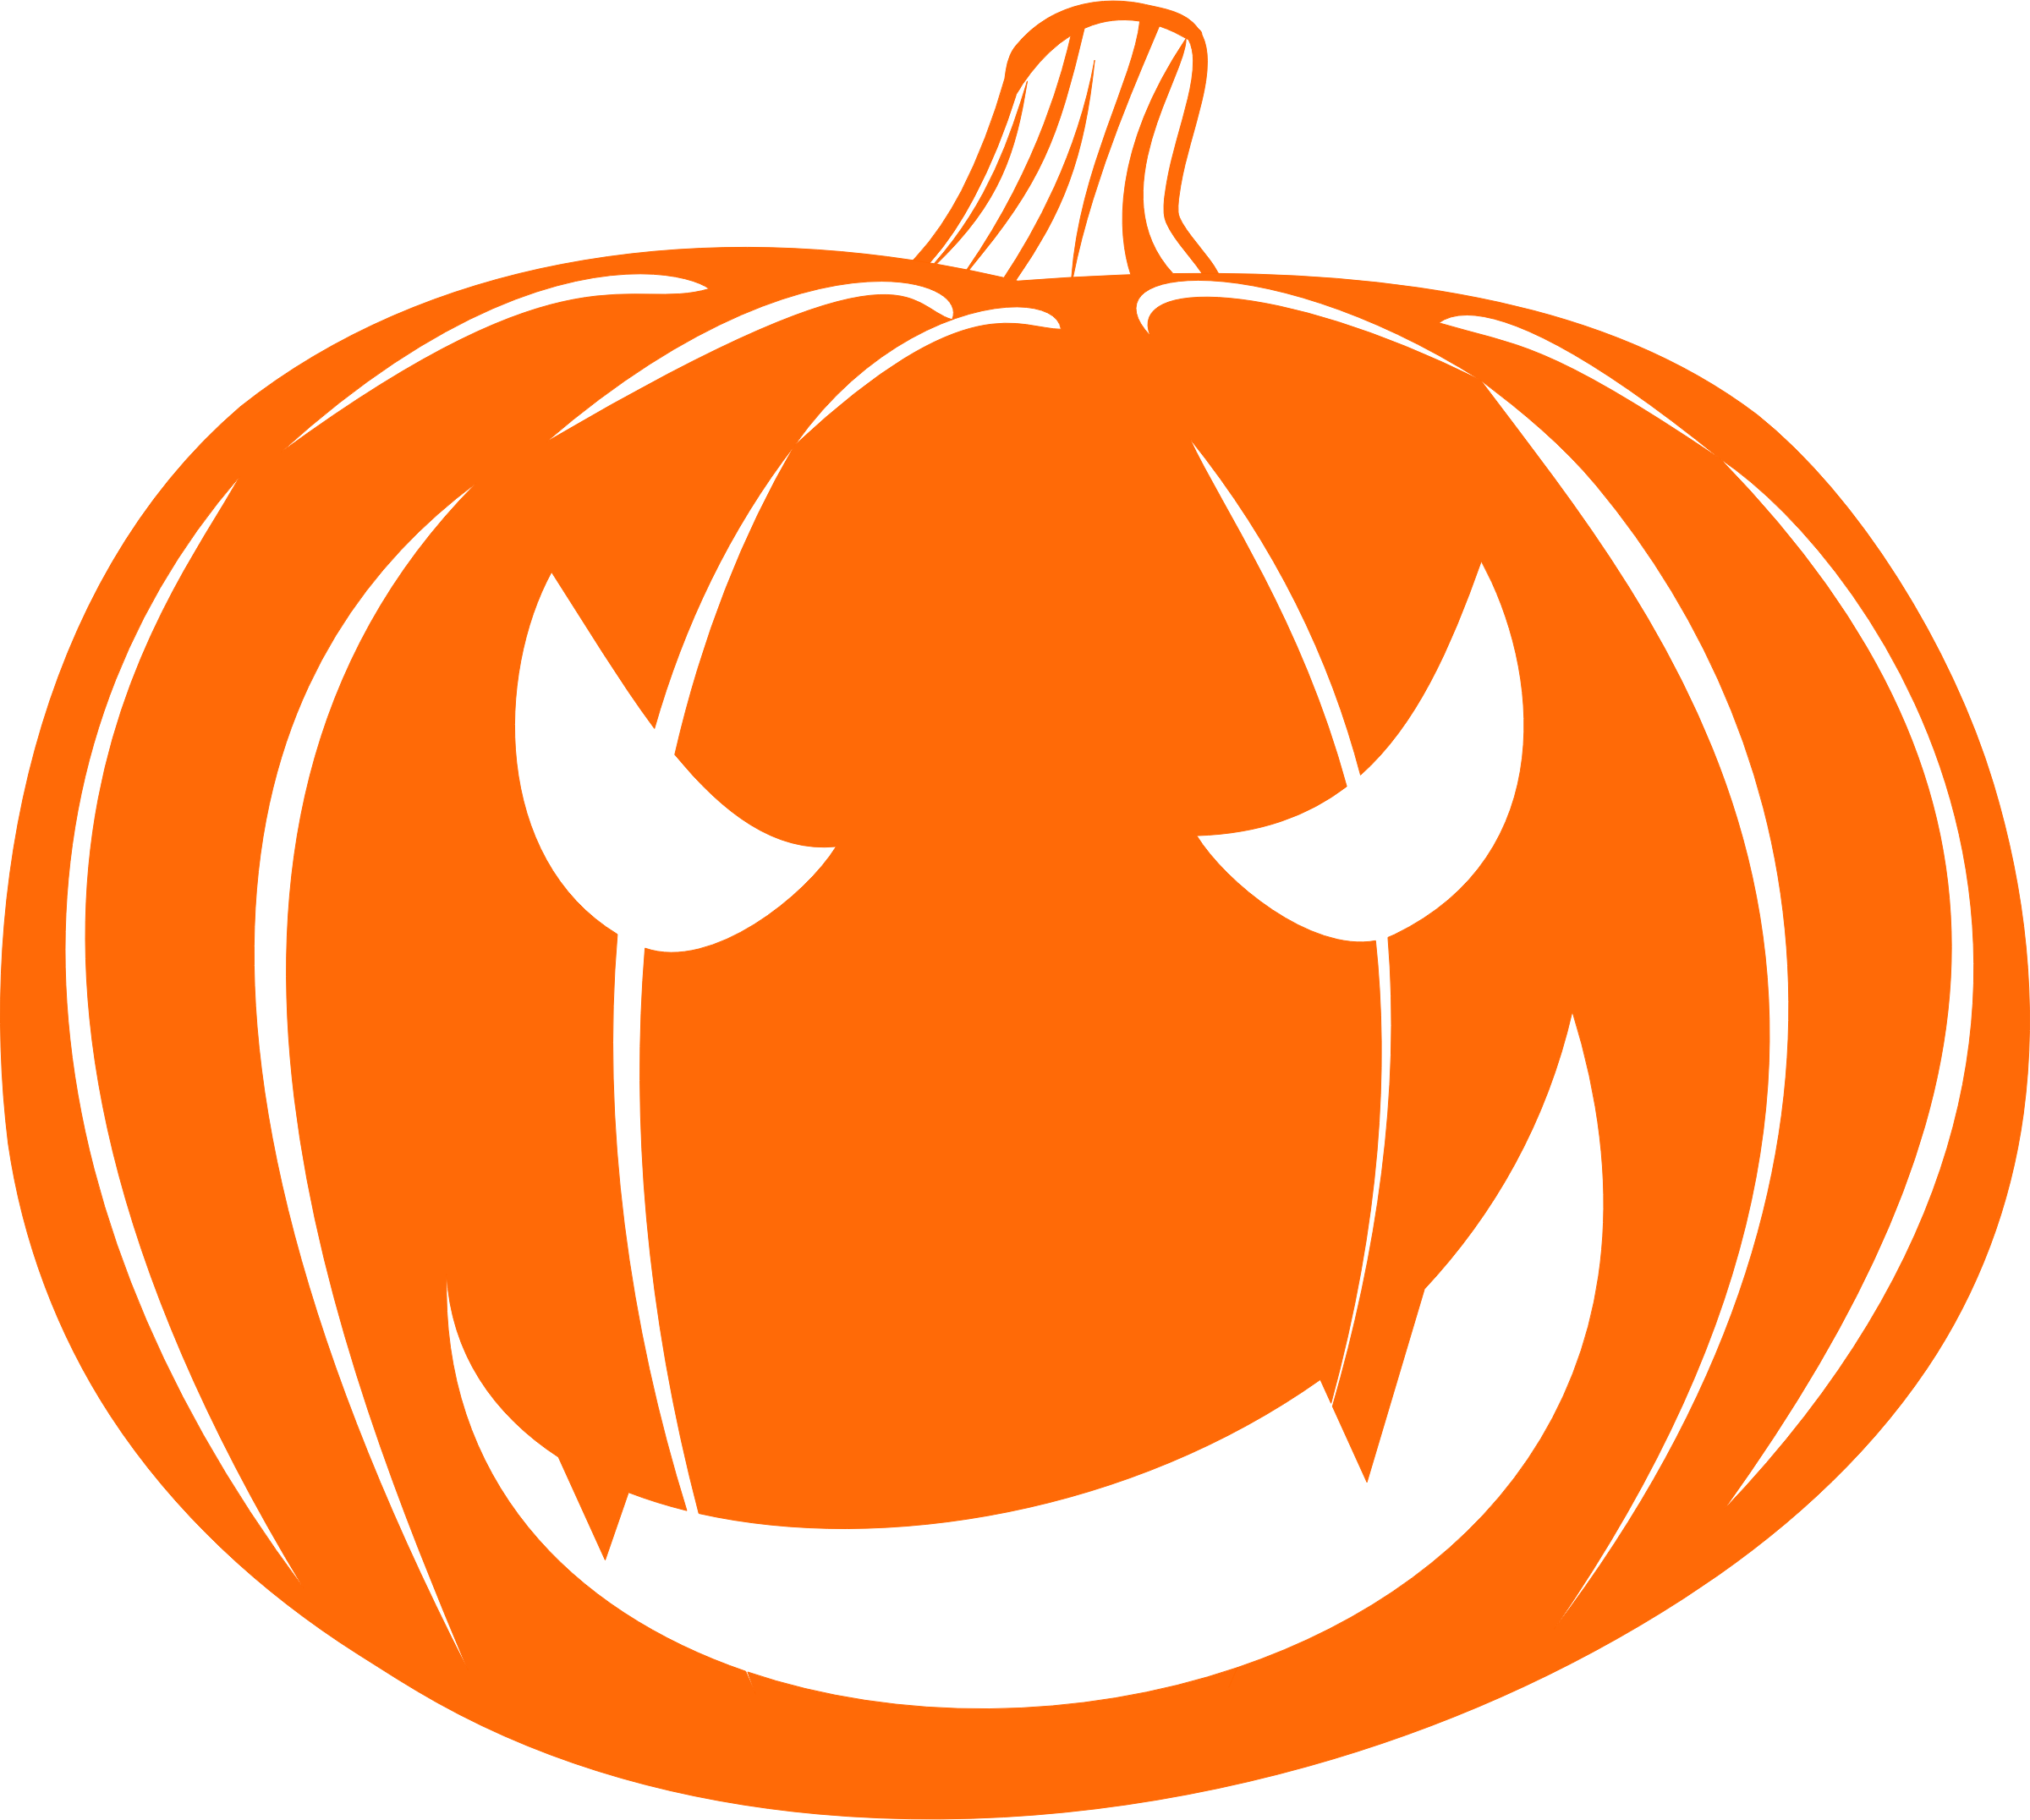 Halloween jack o lantern clipart graphic transparent stock Clipart - Vampire Jack-o'-lantern graphic transparent stock